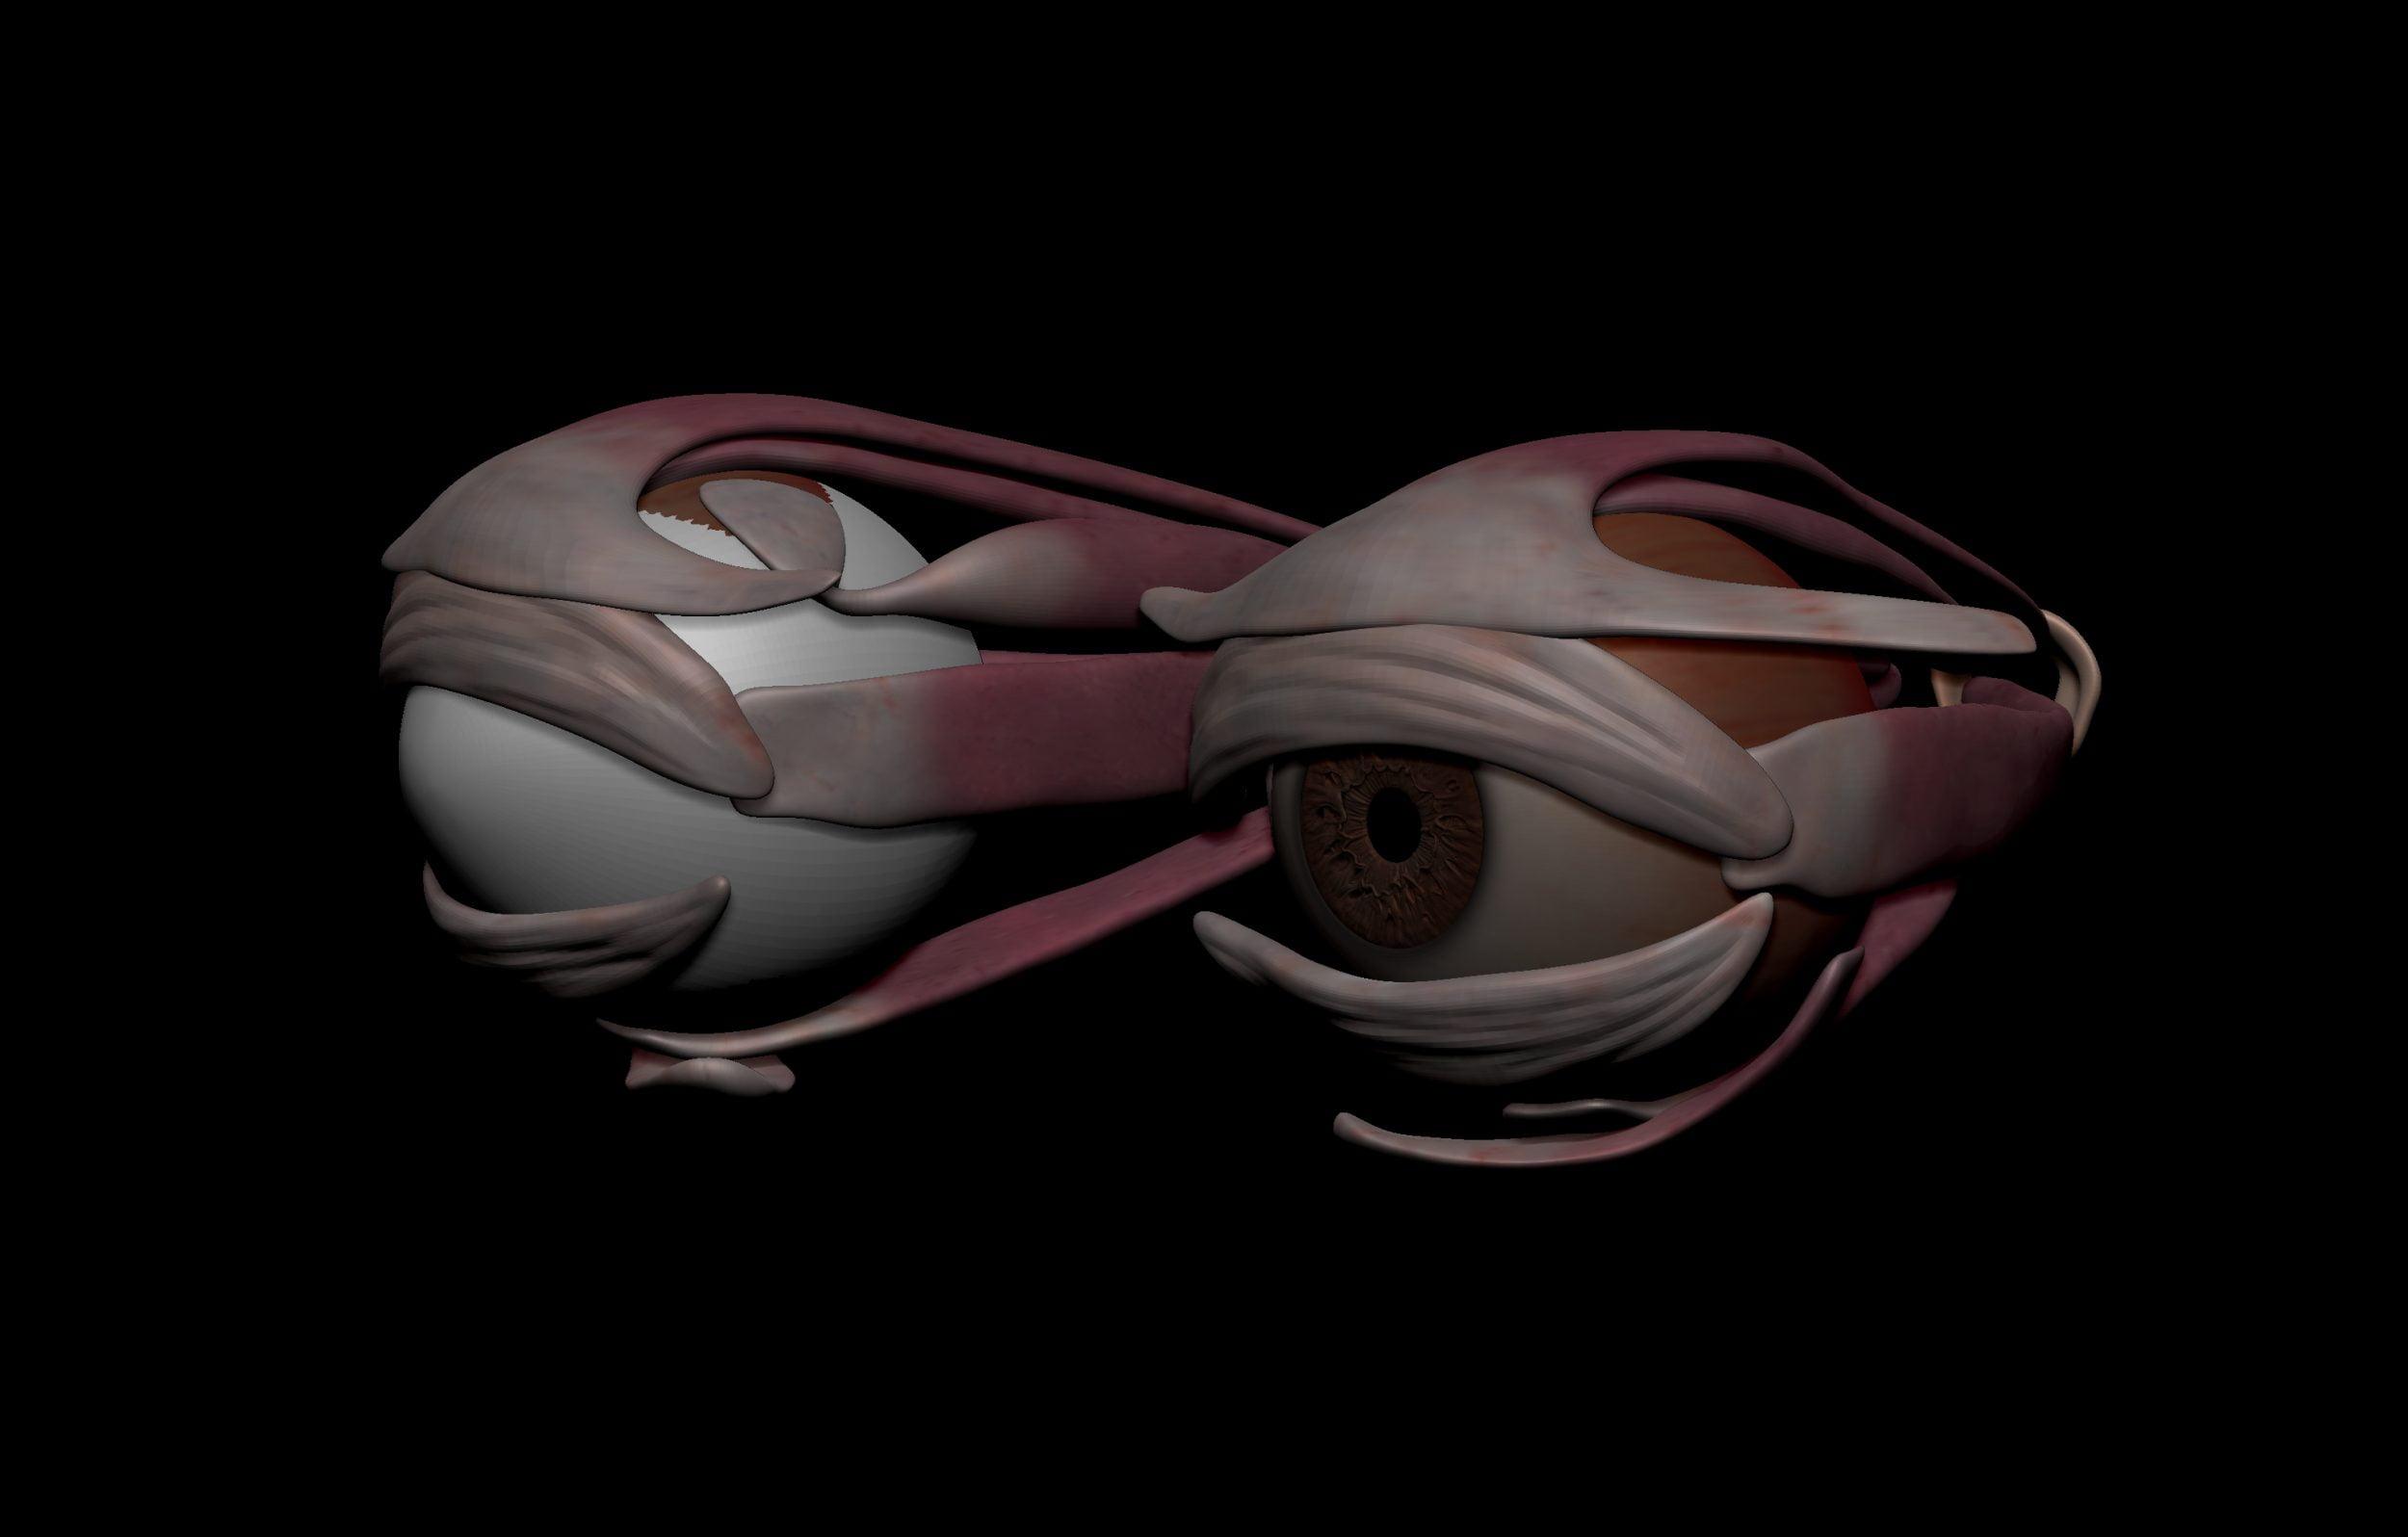 2 6 scaled SA Anatomy | Study Anatomy in 3D